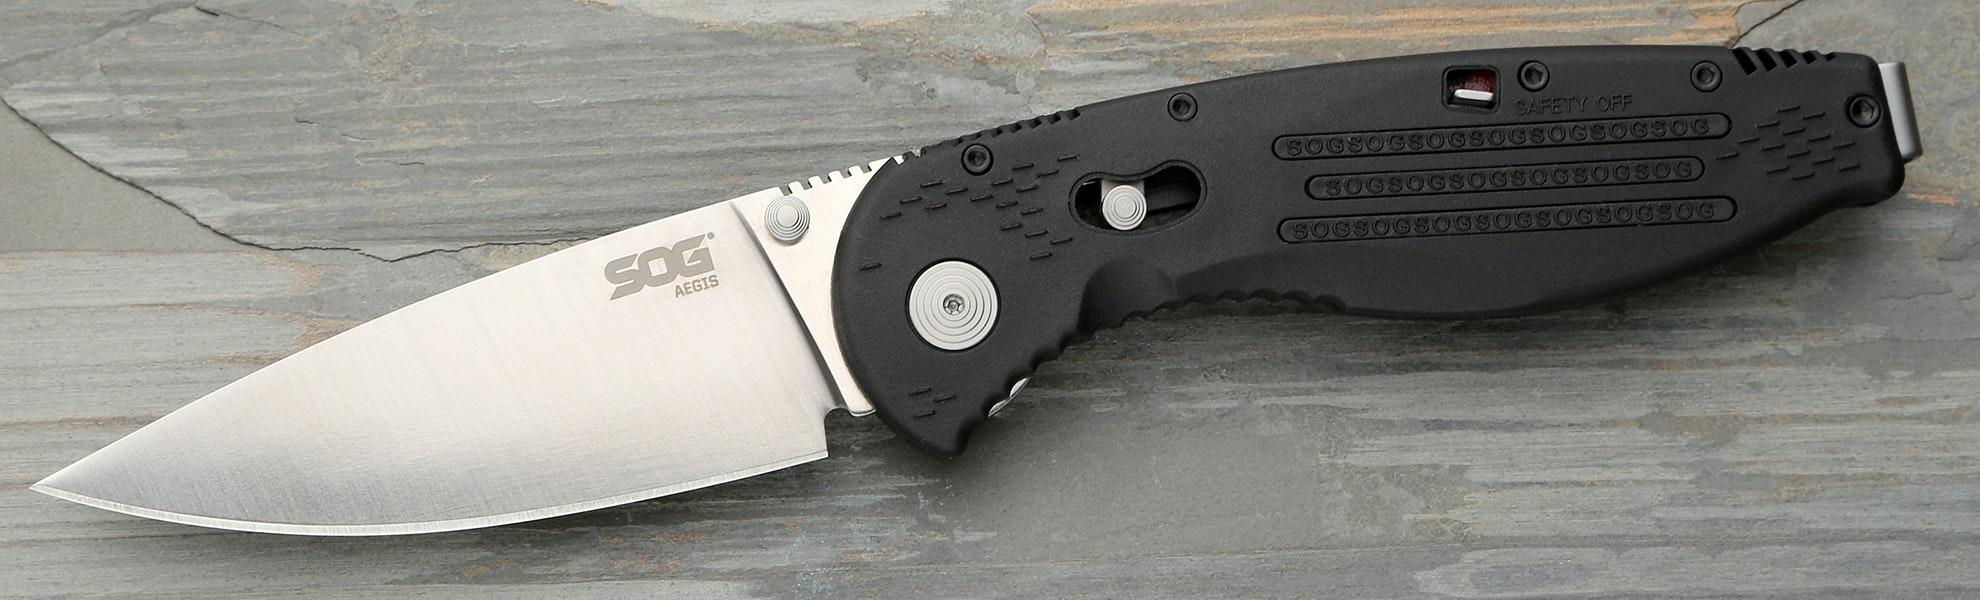 SOG Aegis Folding Knife, Assisted.